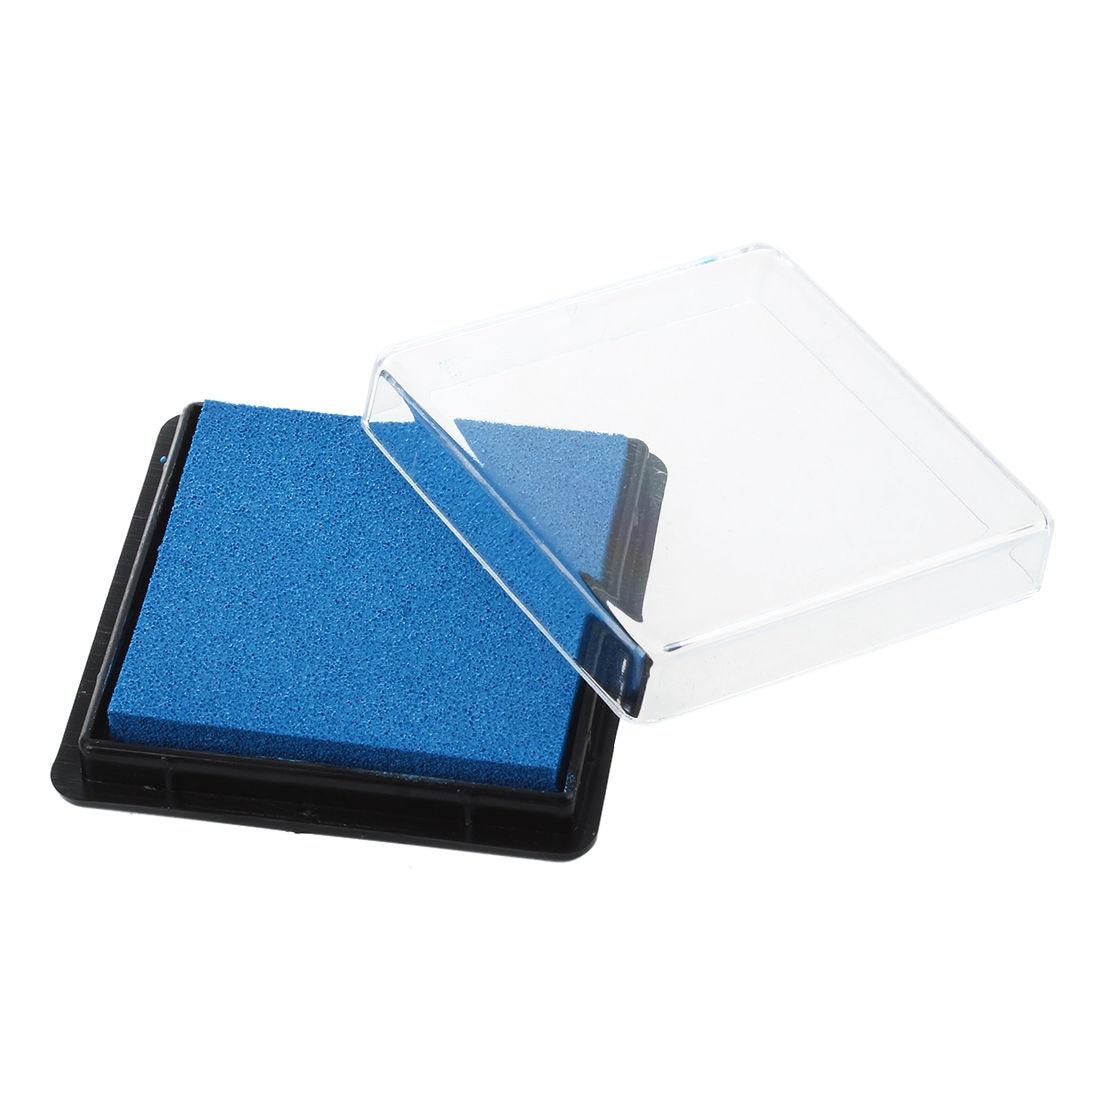 Ink Pad Stamp Pad For Wedding Letter Document Light Blue